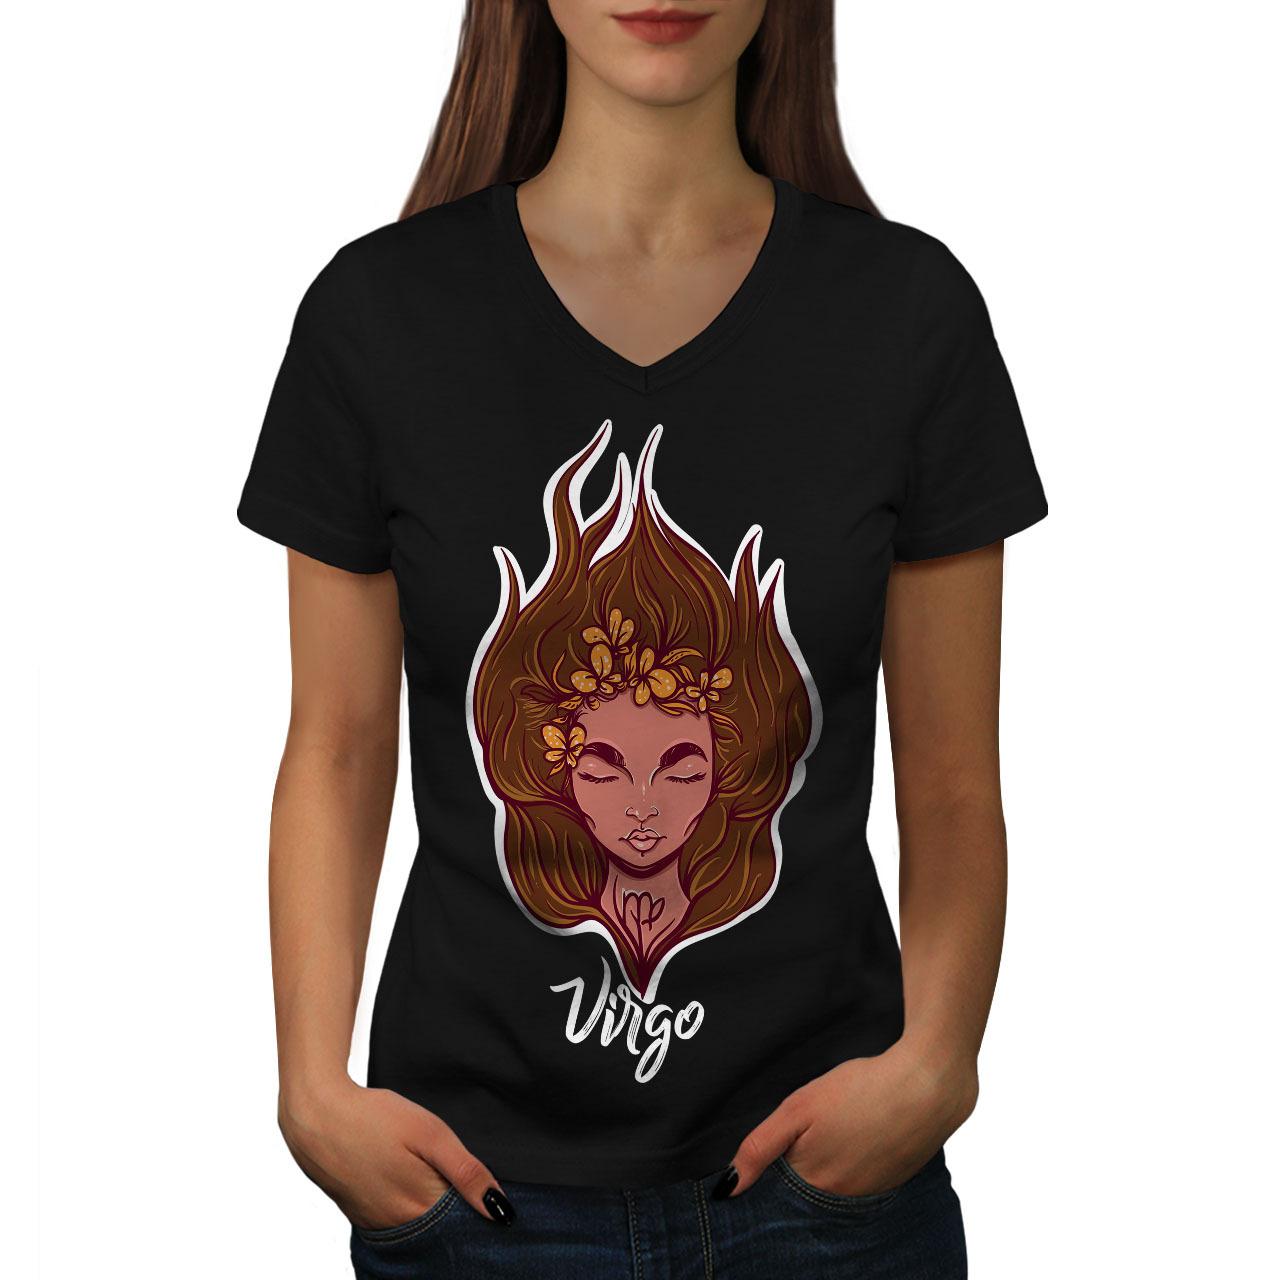 Virgo Shirt Zodiac Sign Women V-Neck T-shirt